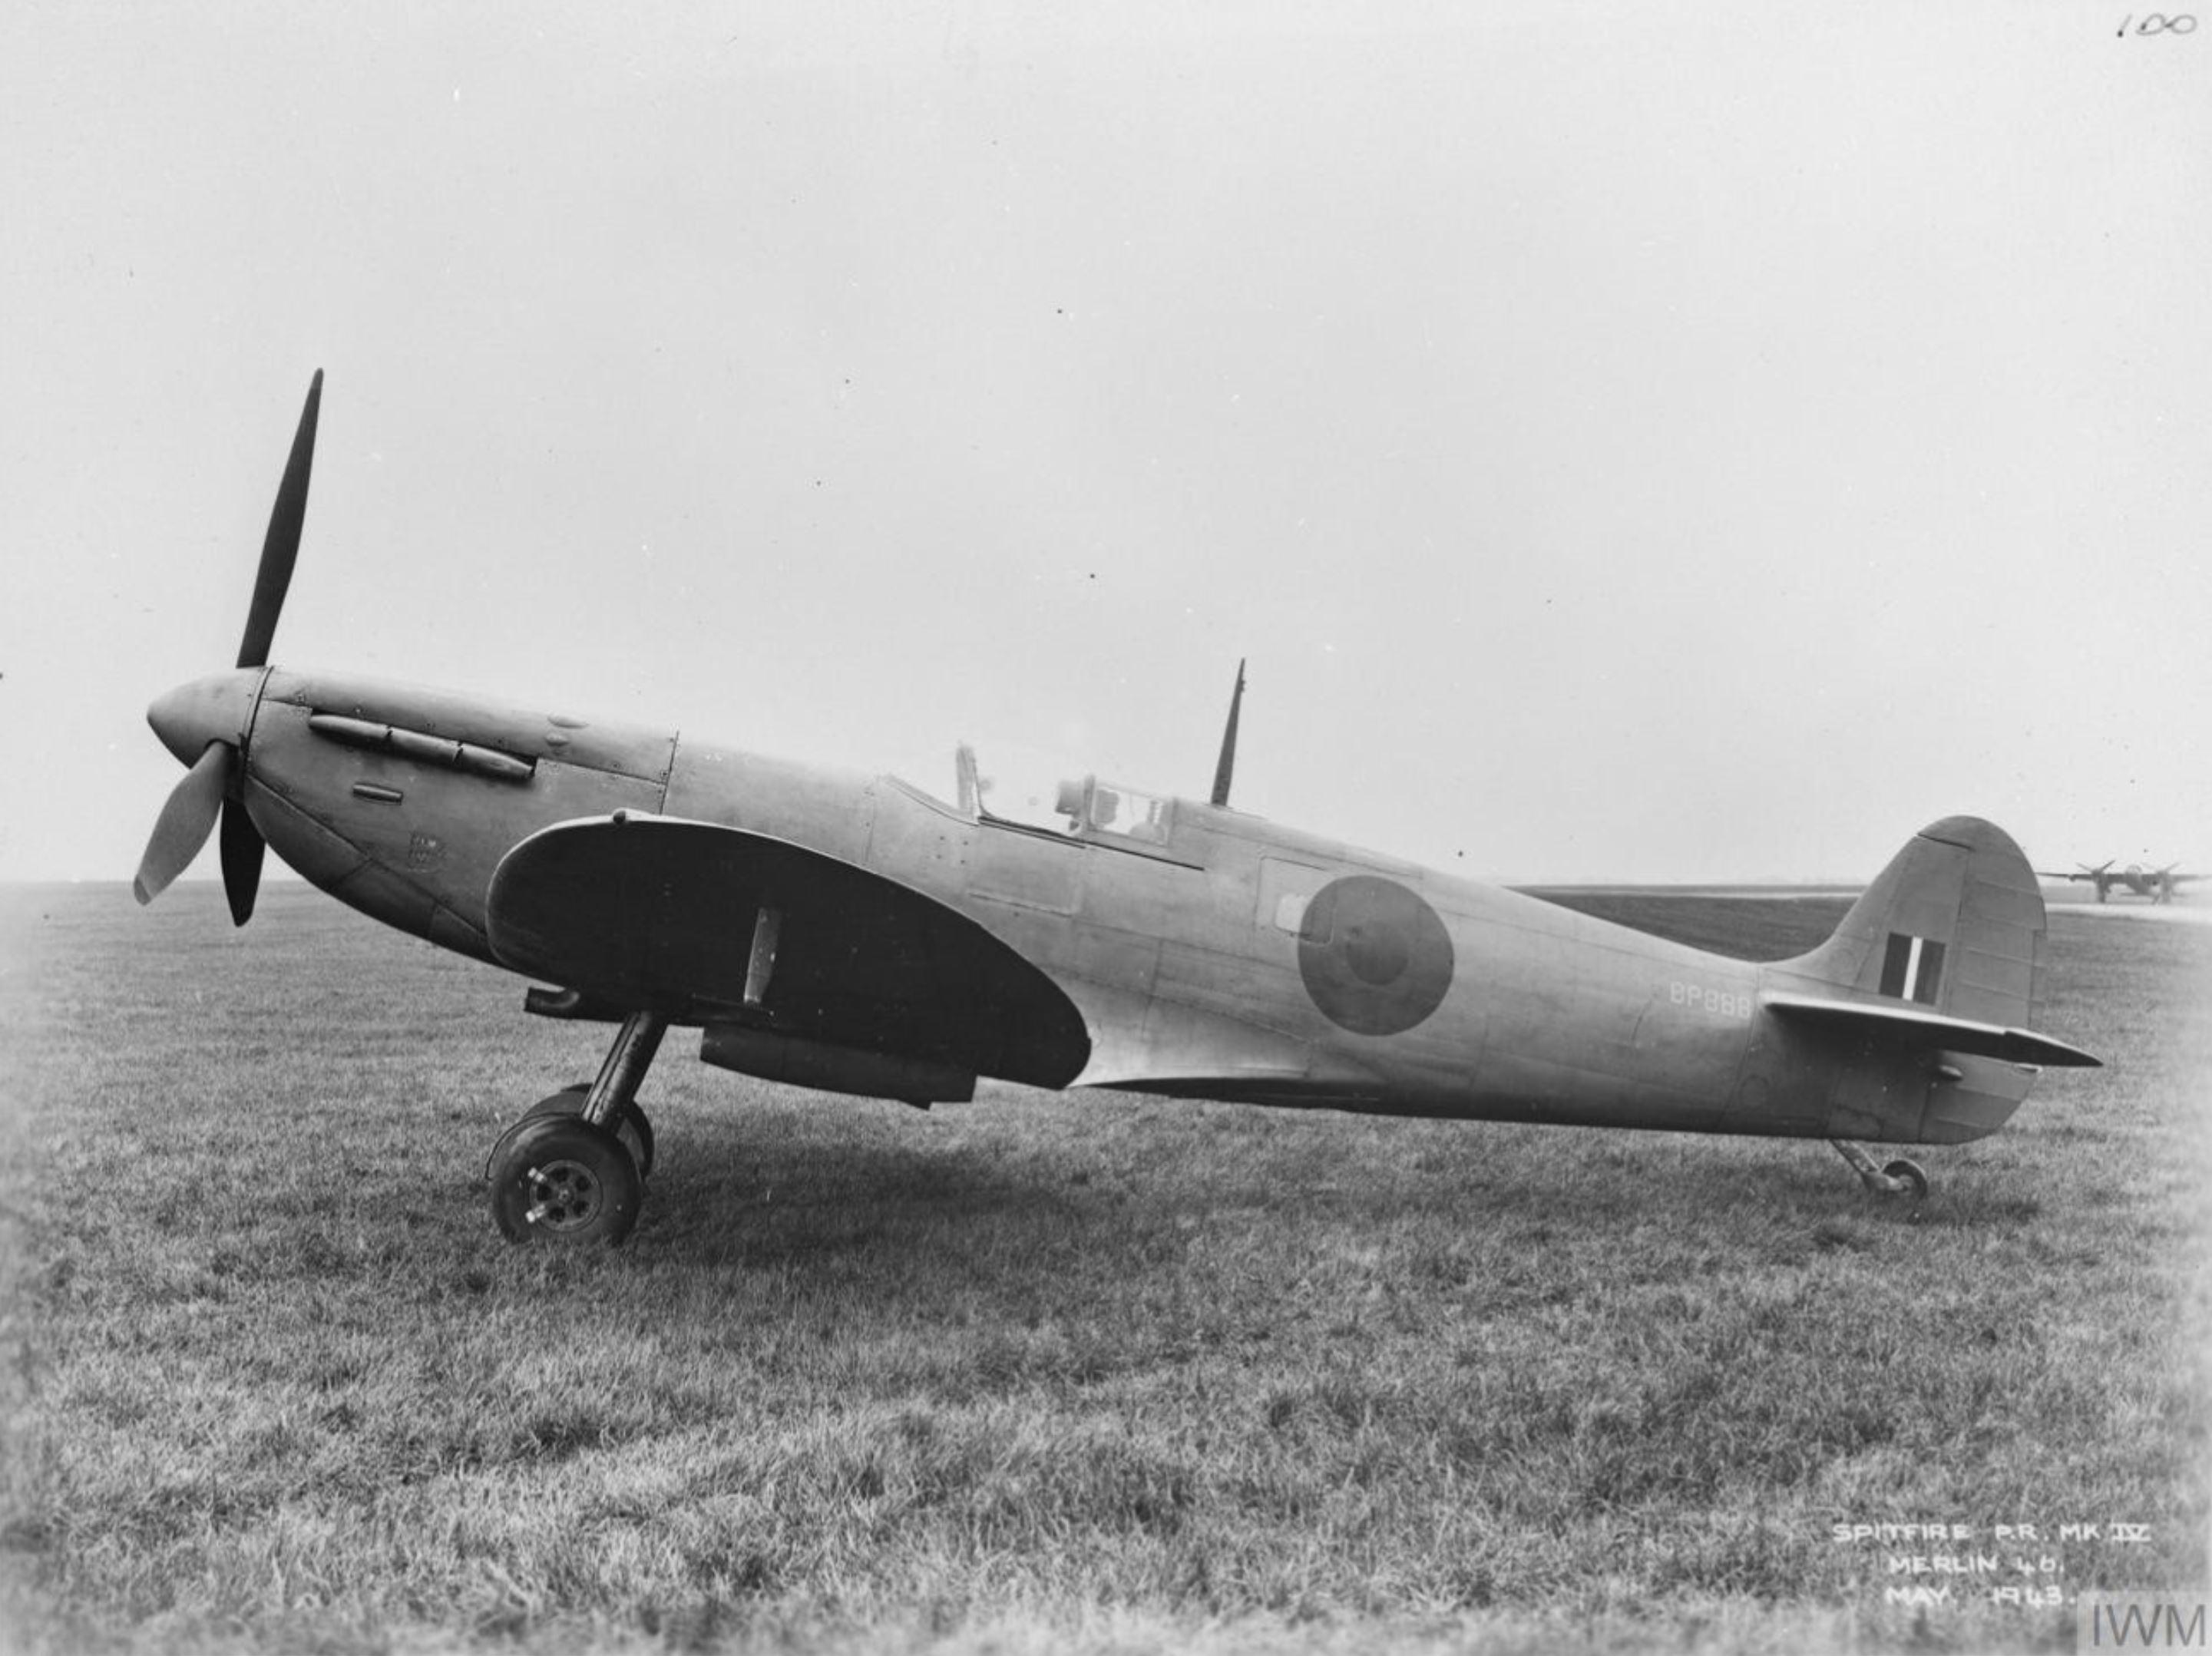 Spitfire PR4 Prototype BP888 England May 1943 IWM MH5107